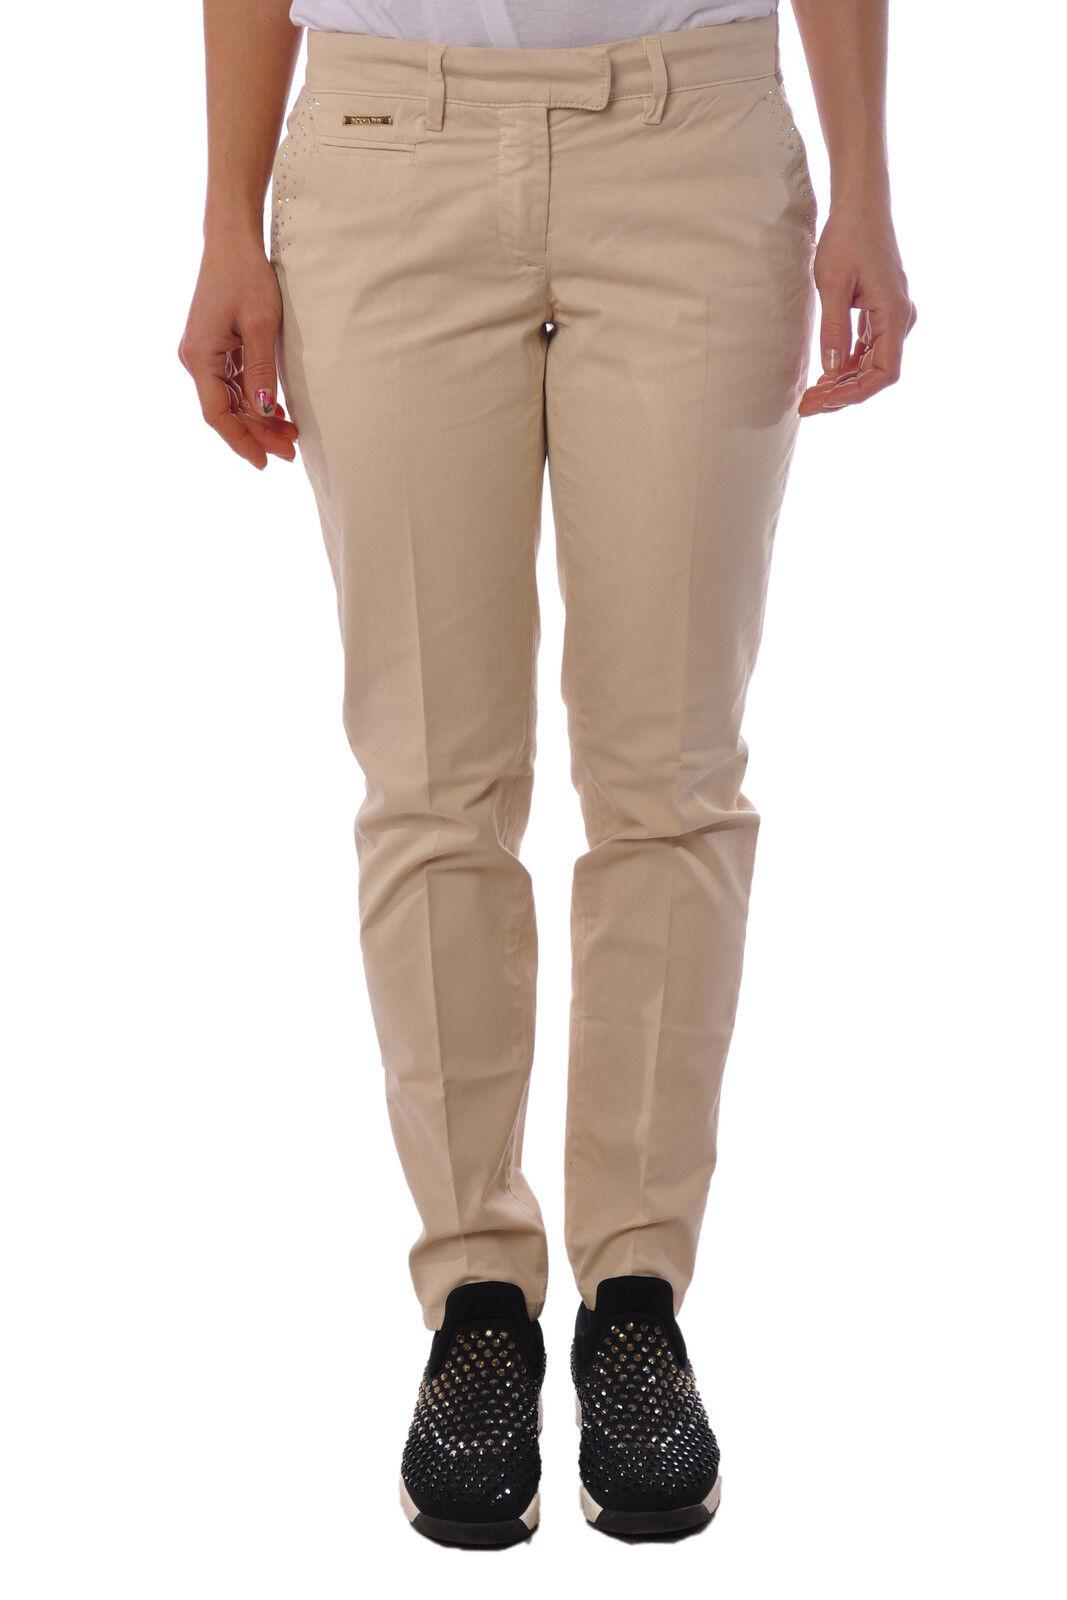 Patrizia Pepe  -  Pants - Female - 29 - Beige - 1633204C160704